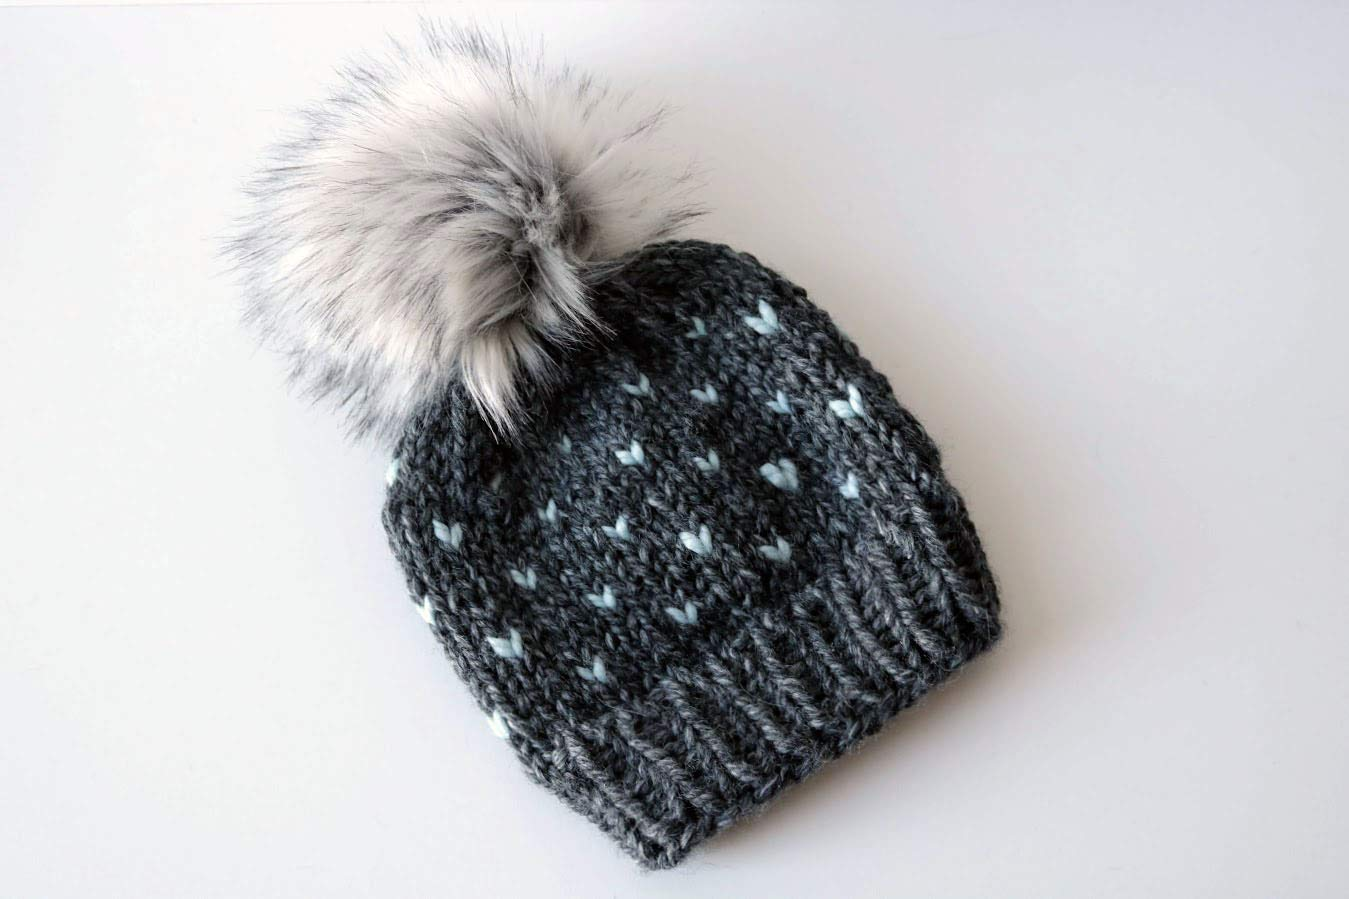 cc6ef249 Amazon.com: Knitted Fair Isle Knit Beanie Hat with Faux Fur Pom Pom  (Adult). Handmade in Chunky, Wool Yarn. Charcoal and Glacier Blue: Handmade